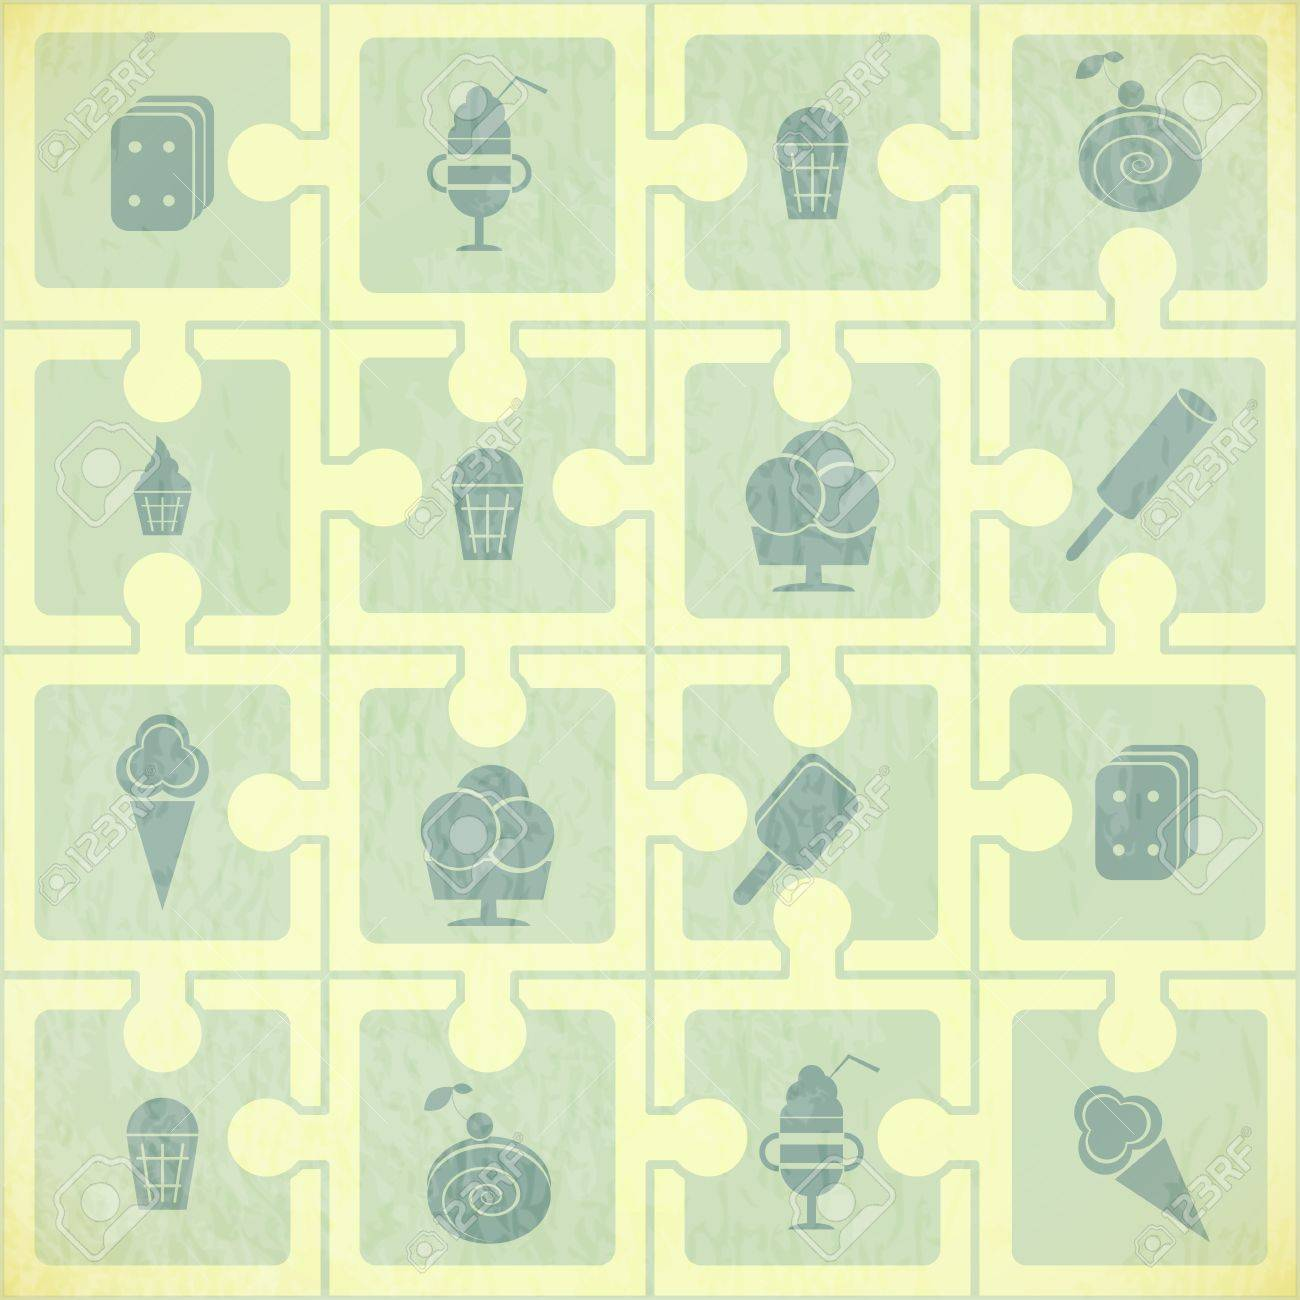 Ice Cream Pattern - Retro Background - Vector Illustration Stock Vector - 14442124